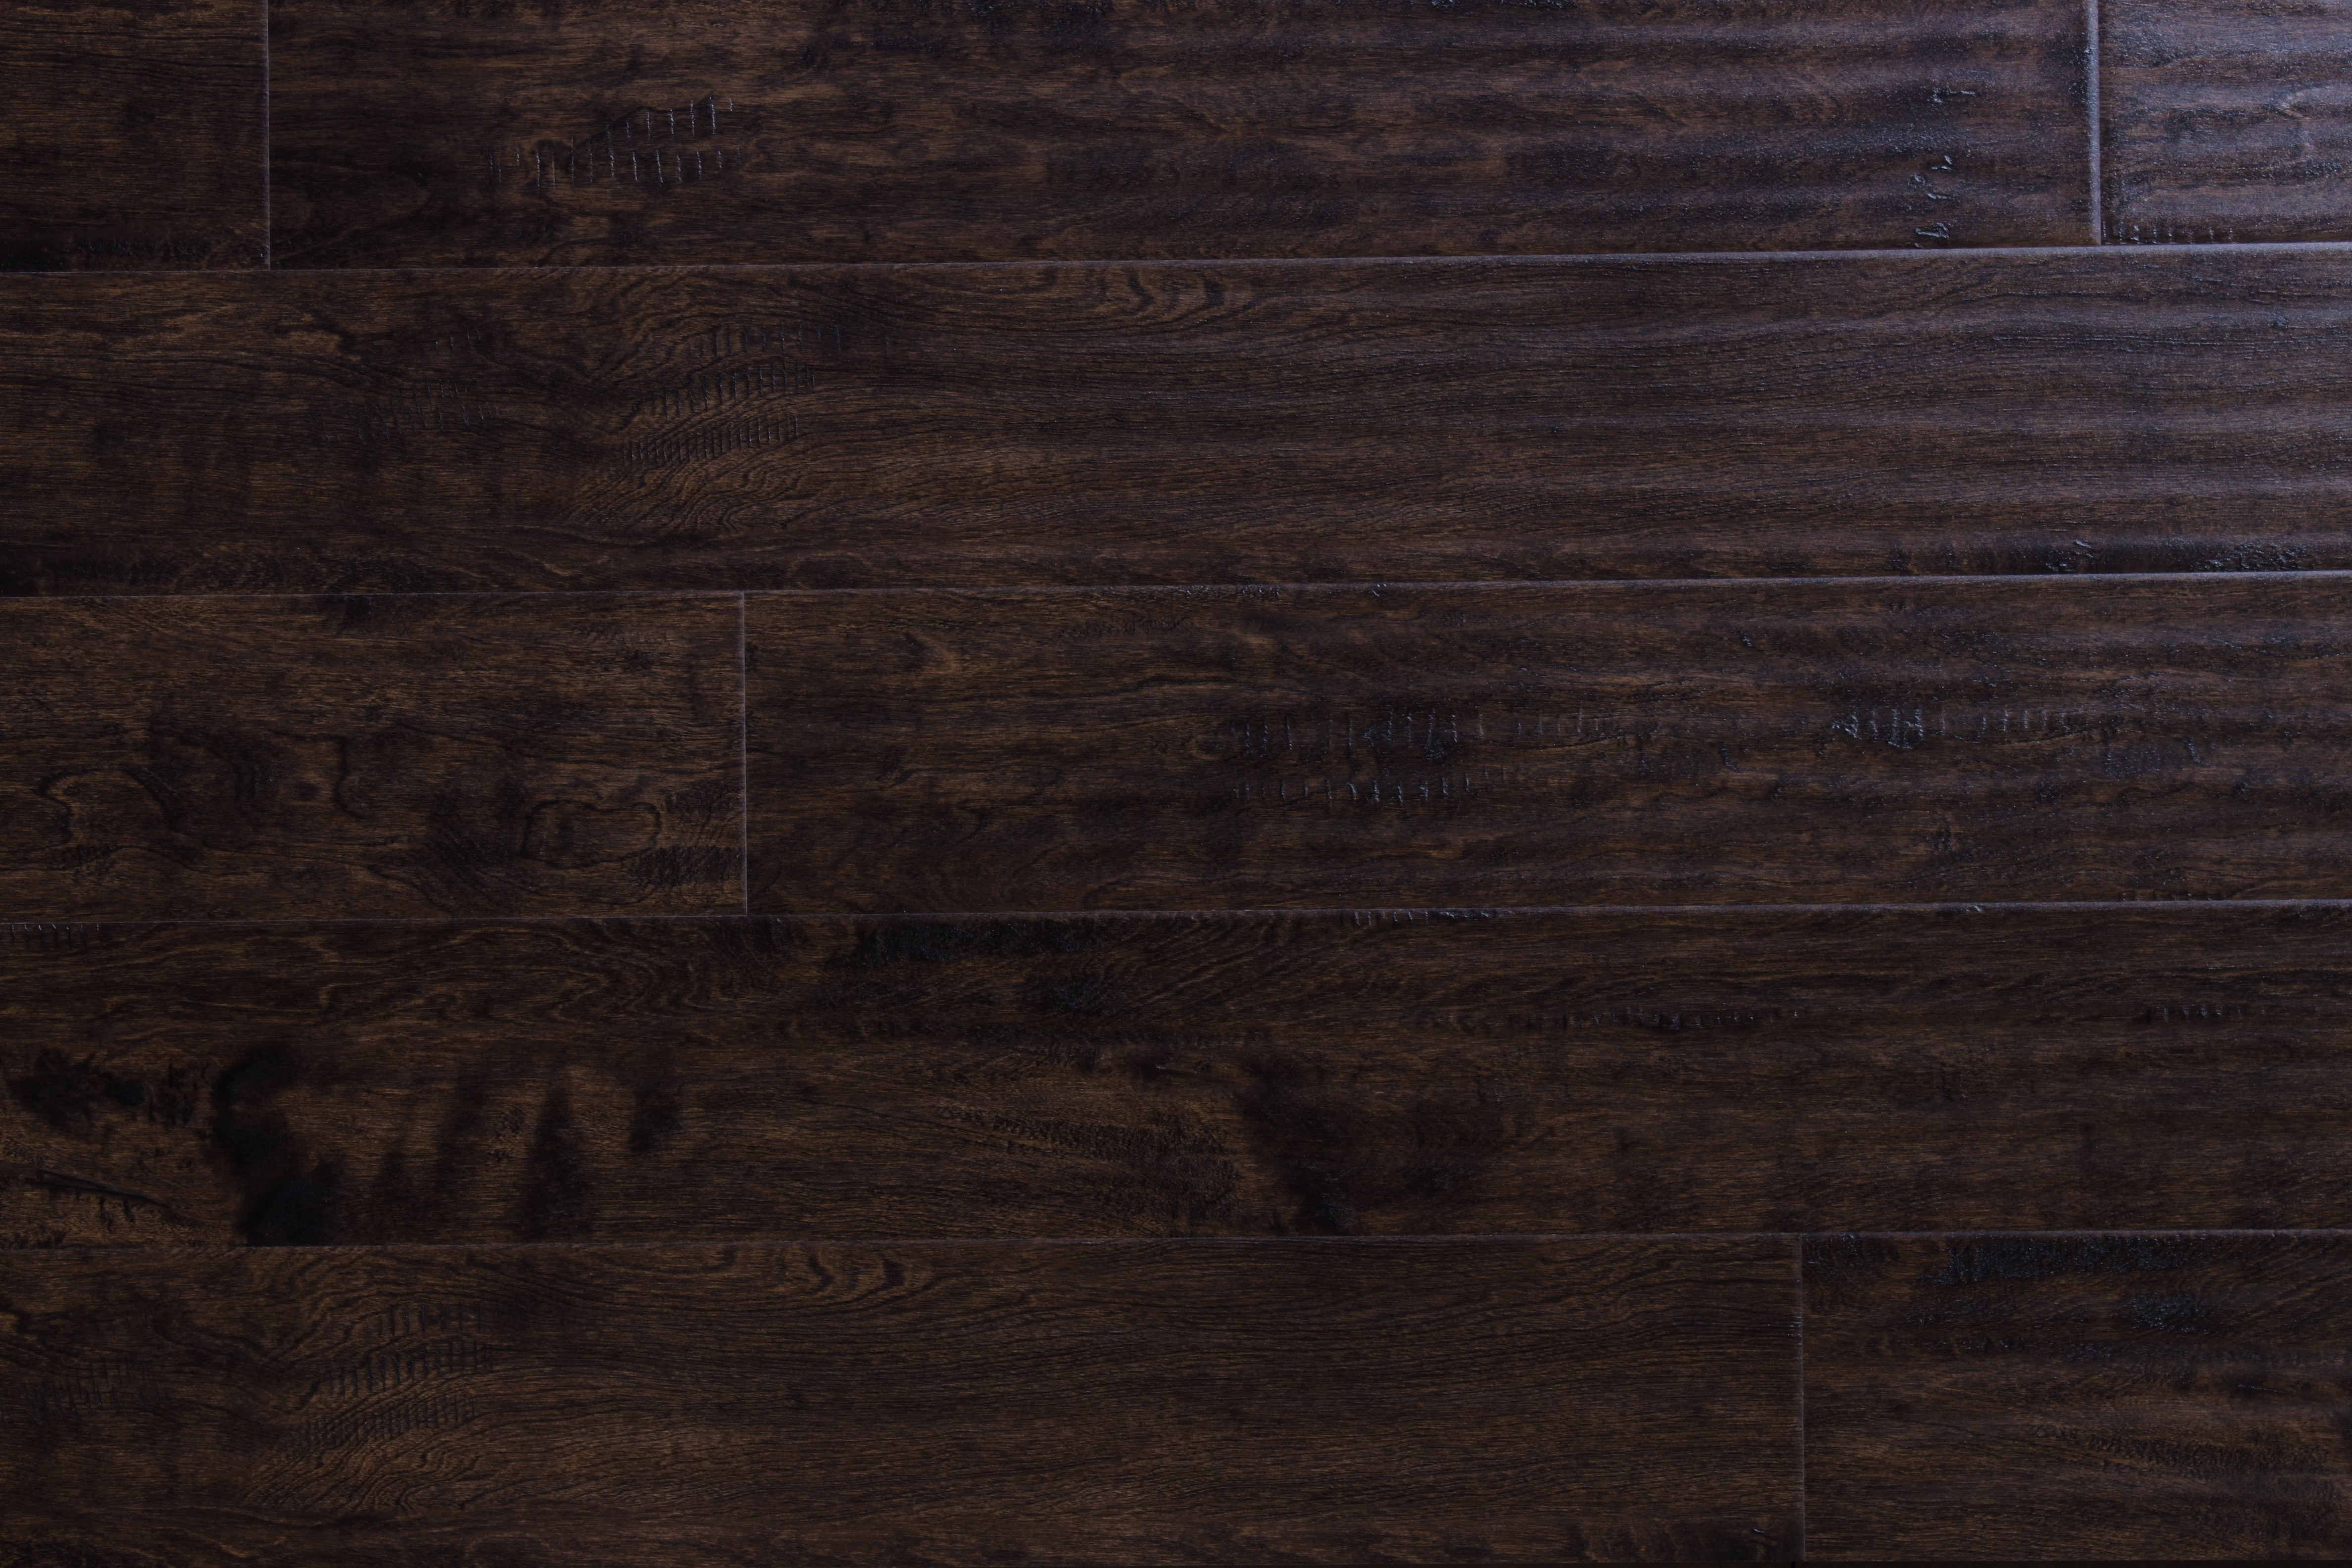 hardwood flooring wholesale atlanta of wood flooring free samples available at builddirecta in tailor multi gb 5874277bb8d3c